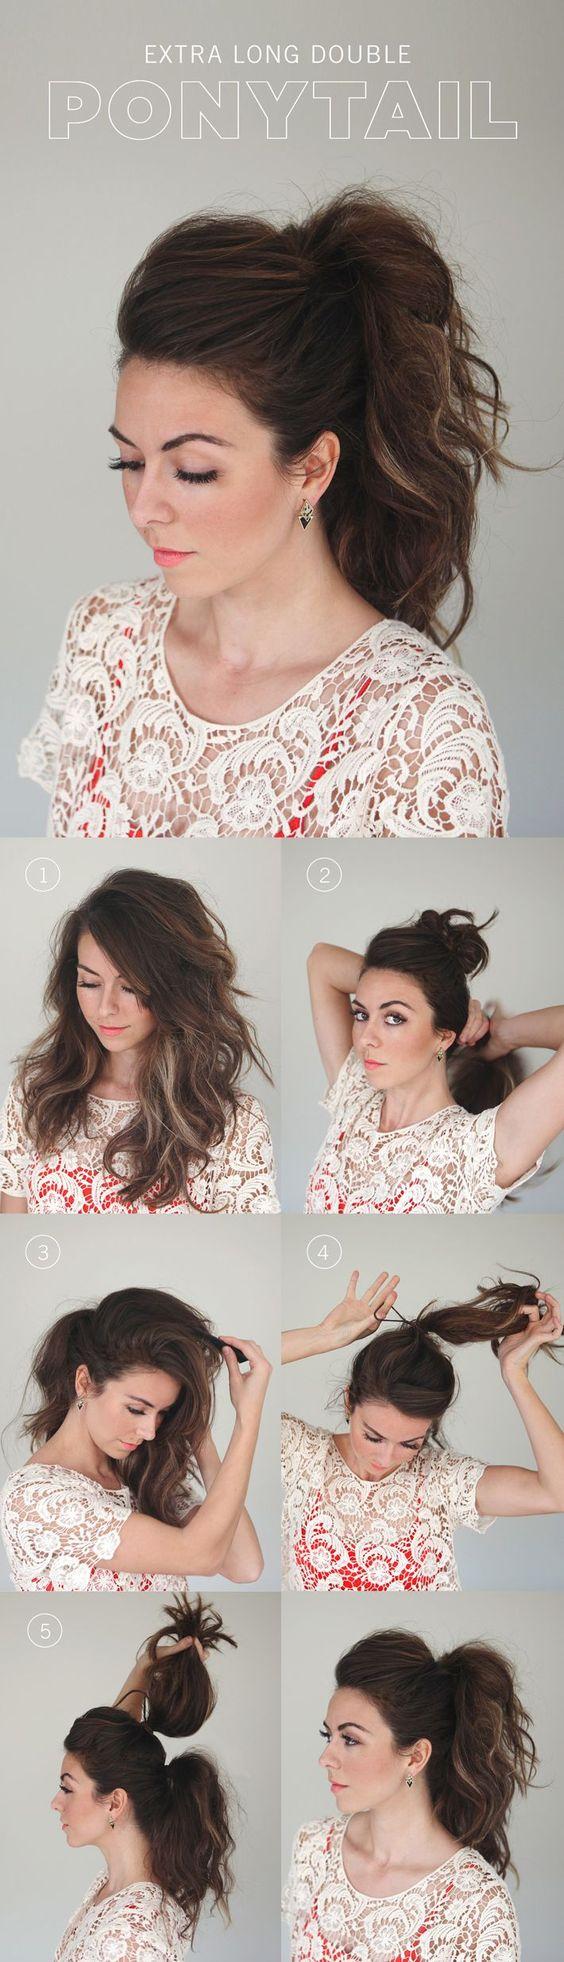 extra long ponytail - Hairpop.net - Hair Pop Hair Shop